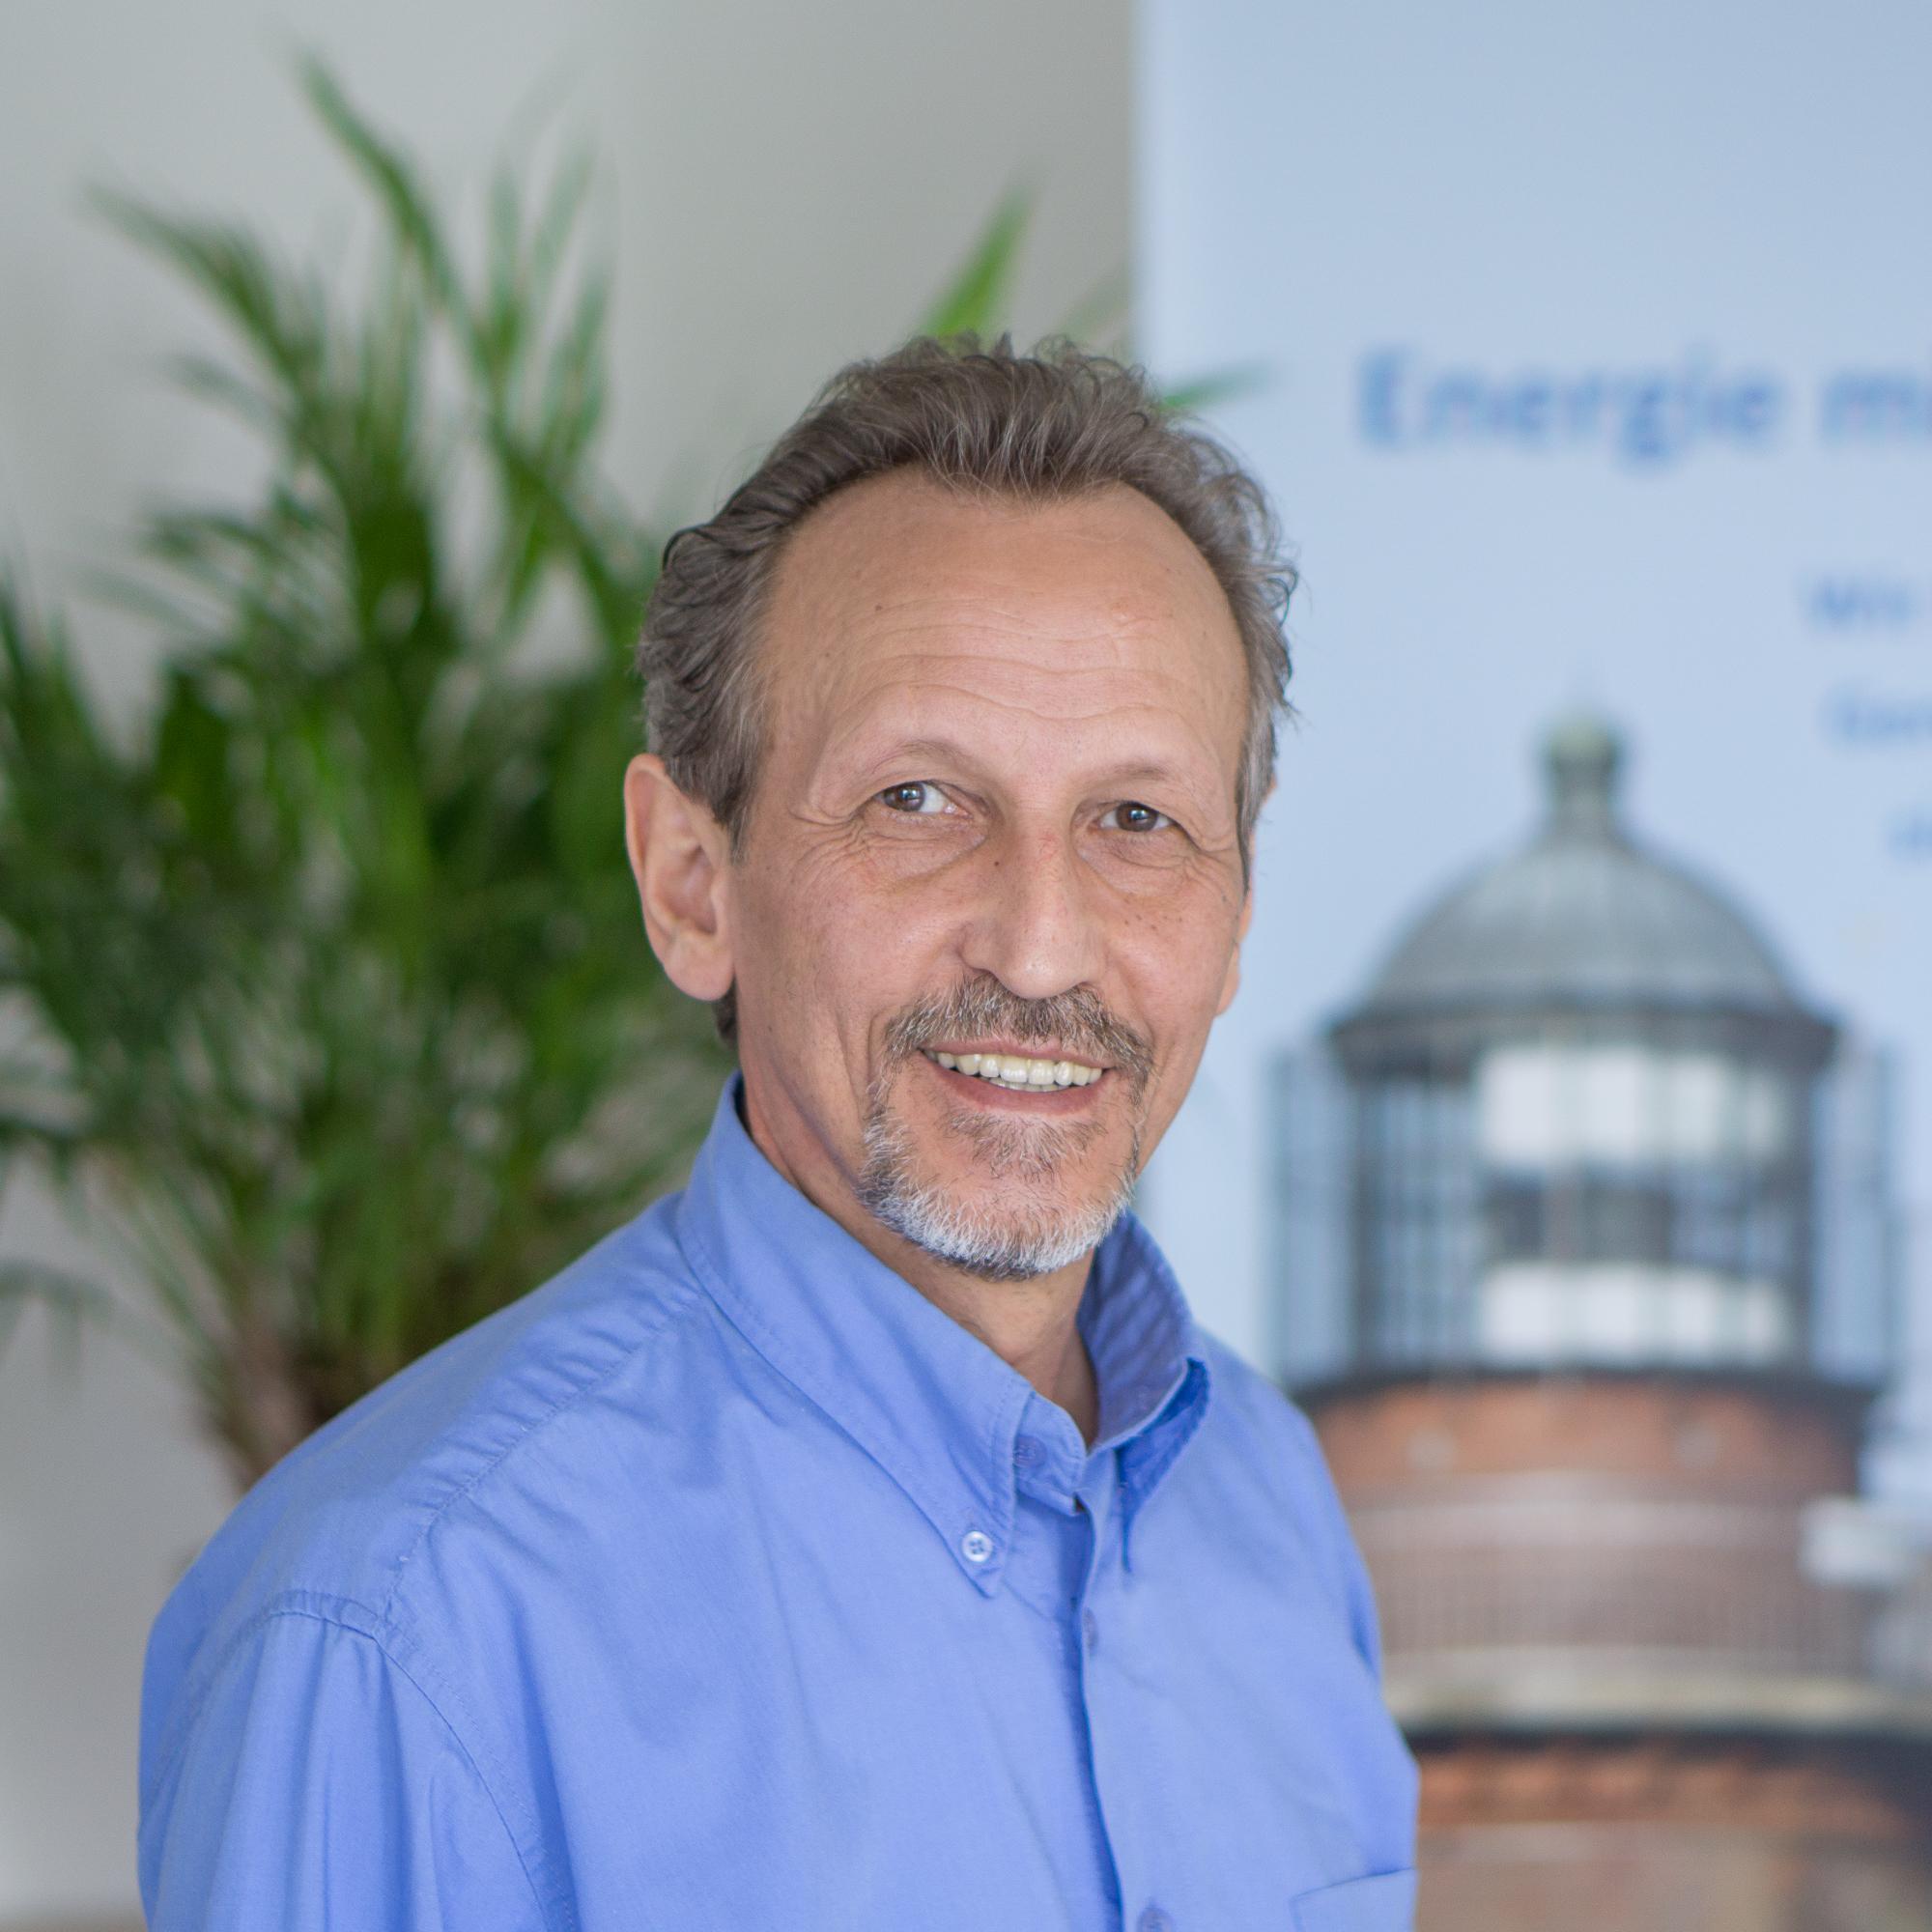 Andreas Wengler